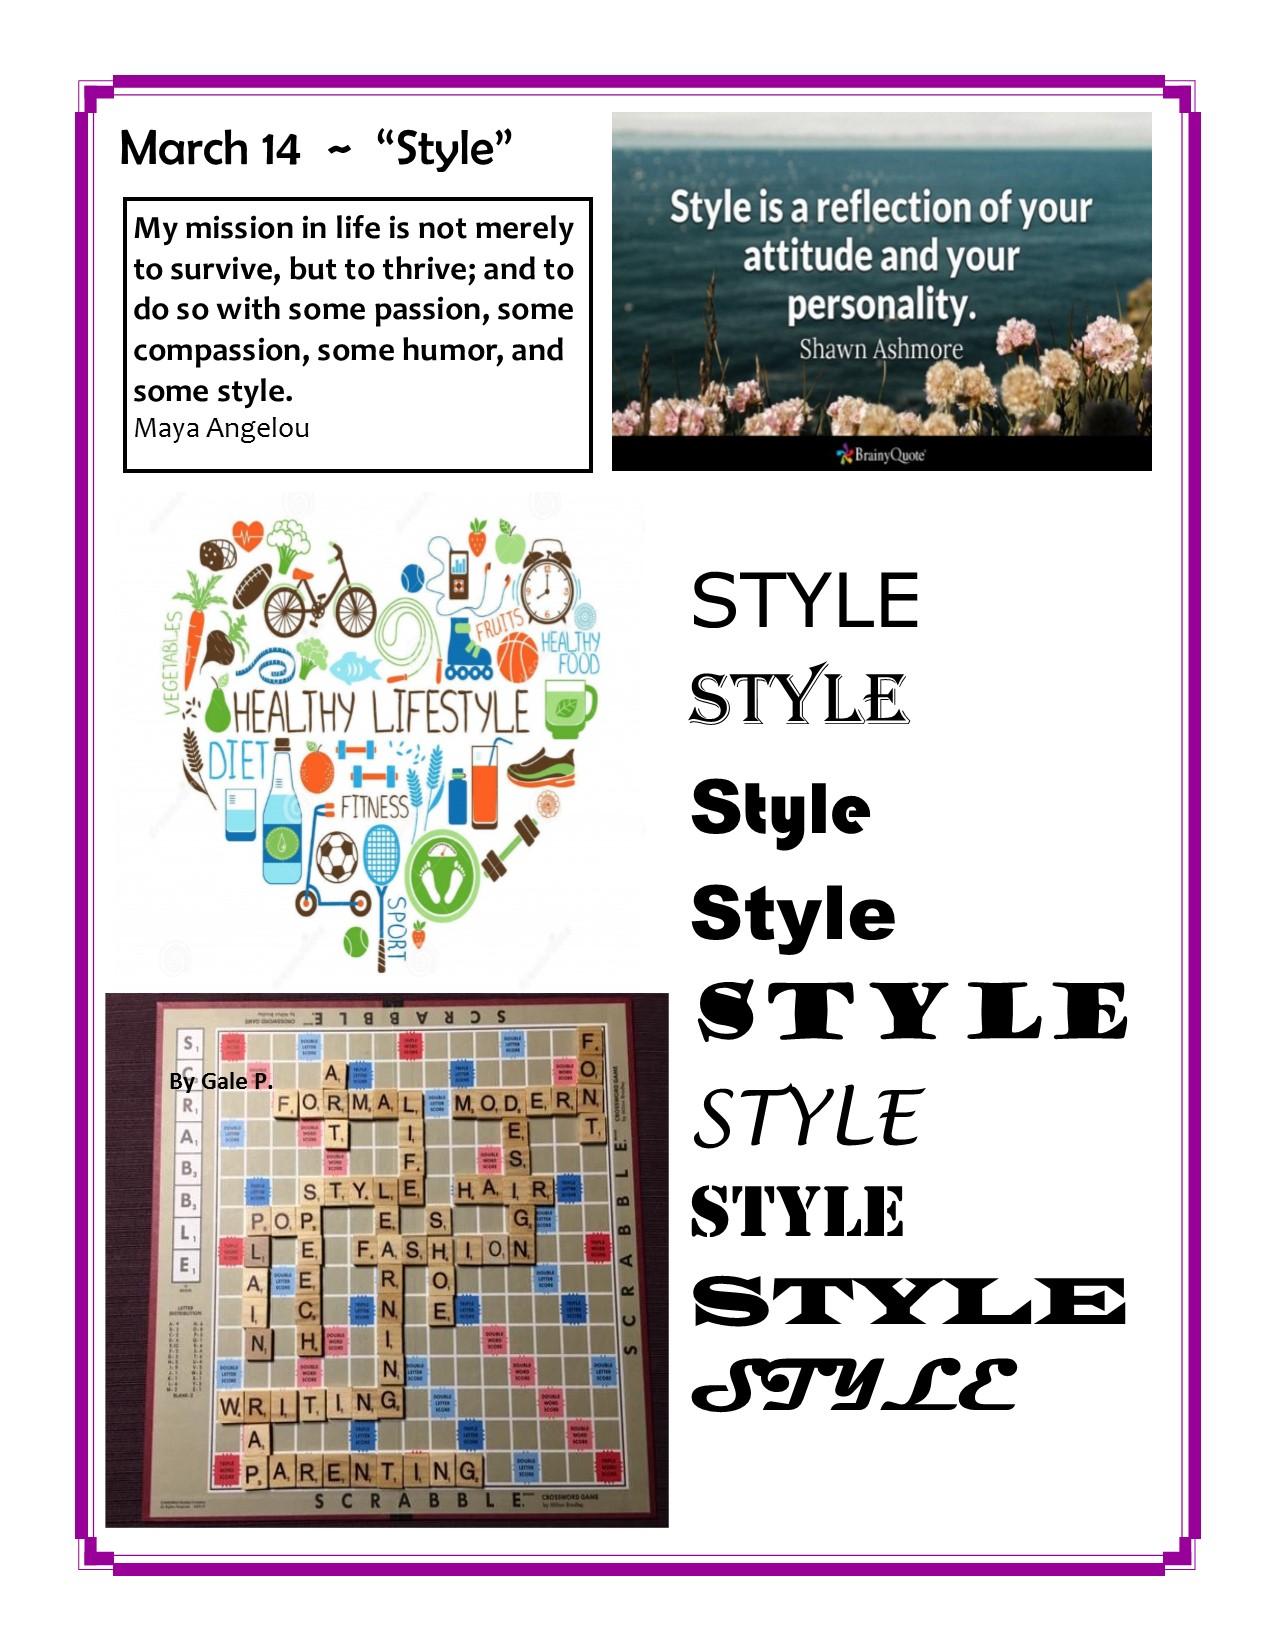 March 14, Style.jpg